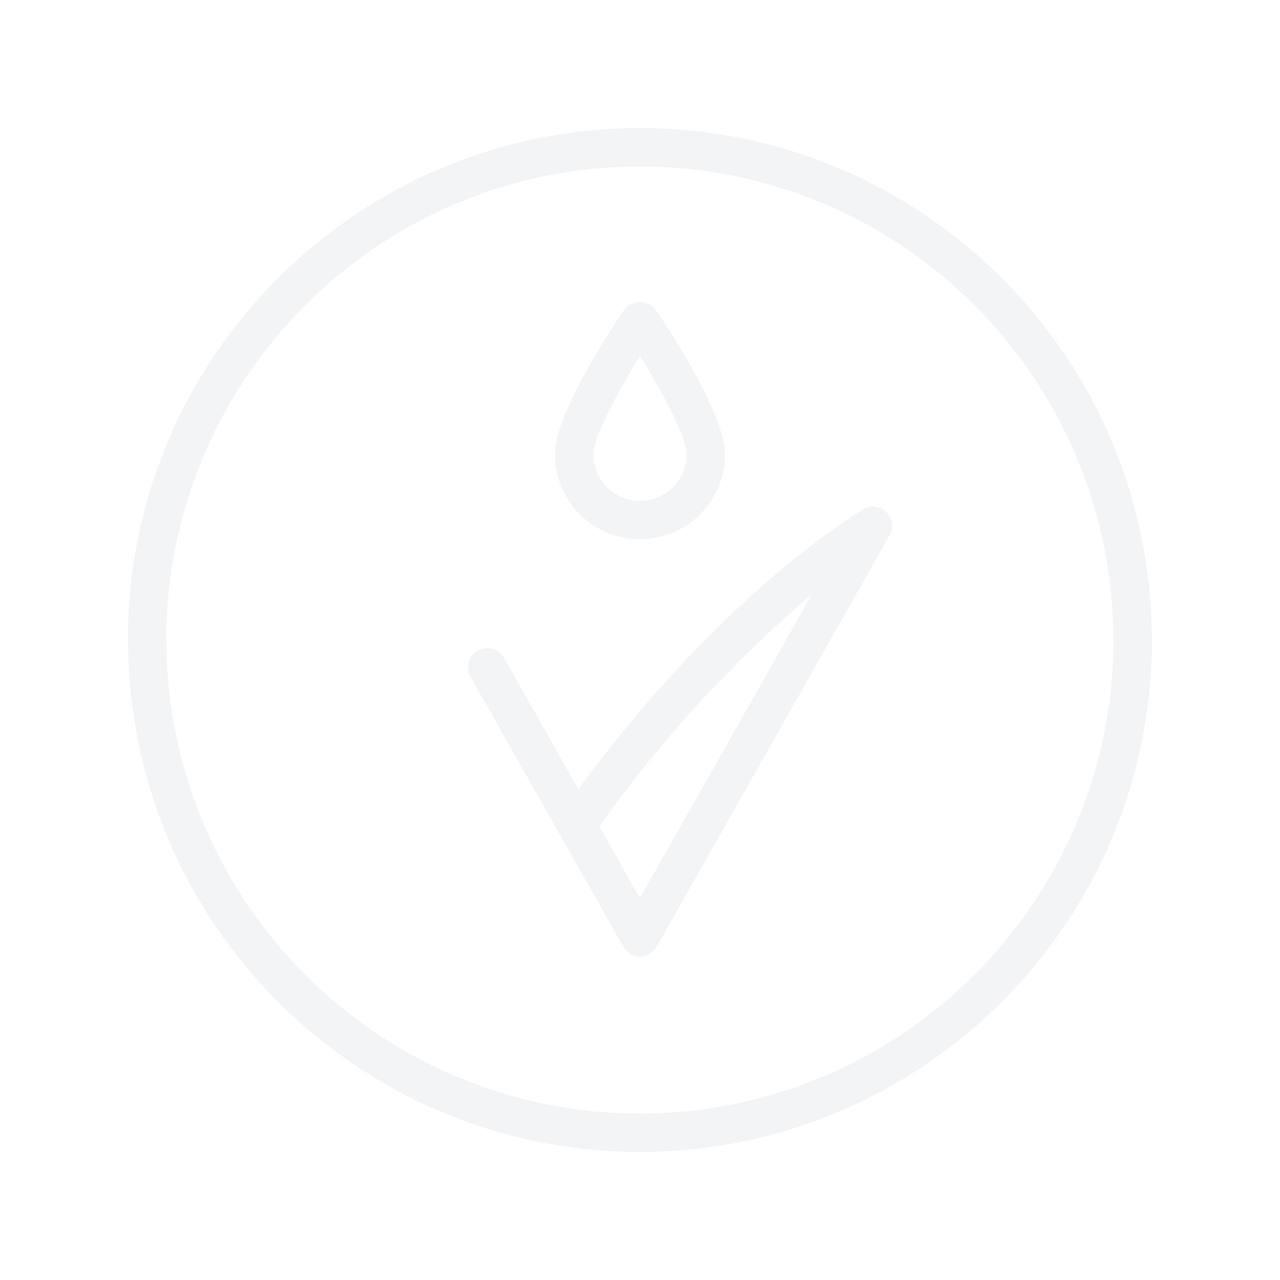 BIOKAP Nutricolor 1.0 Black Permanent Hair Dye 140ml